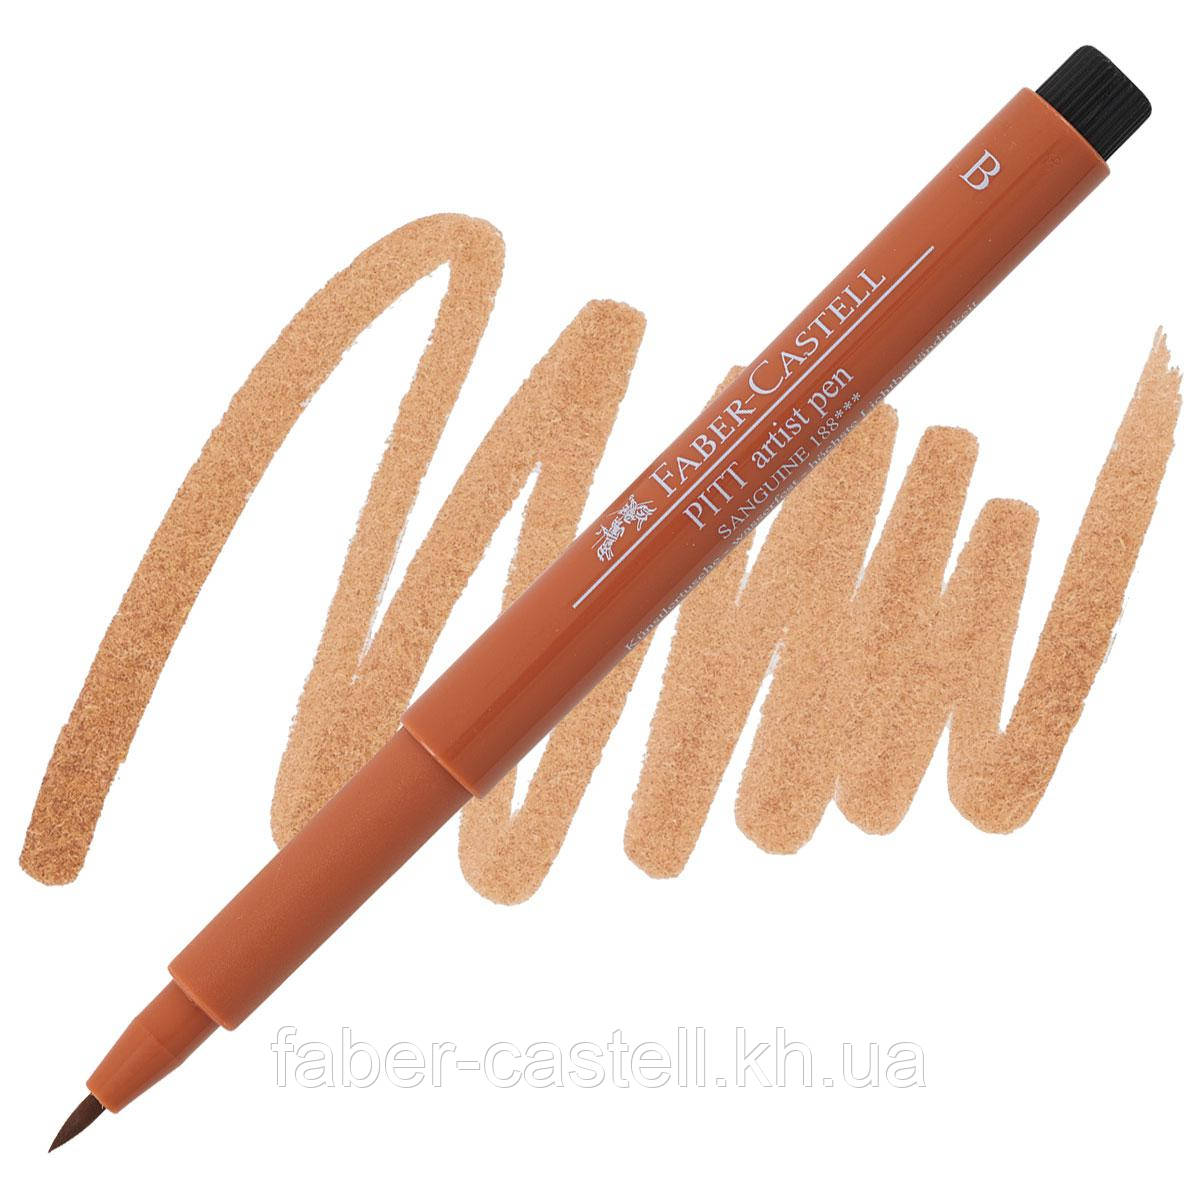 "Ручка-кисточка капиллярная Faber - Castell PITT® ARTIST PEN ""BRUSH"" №188 сангина, 167488"